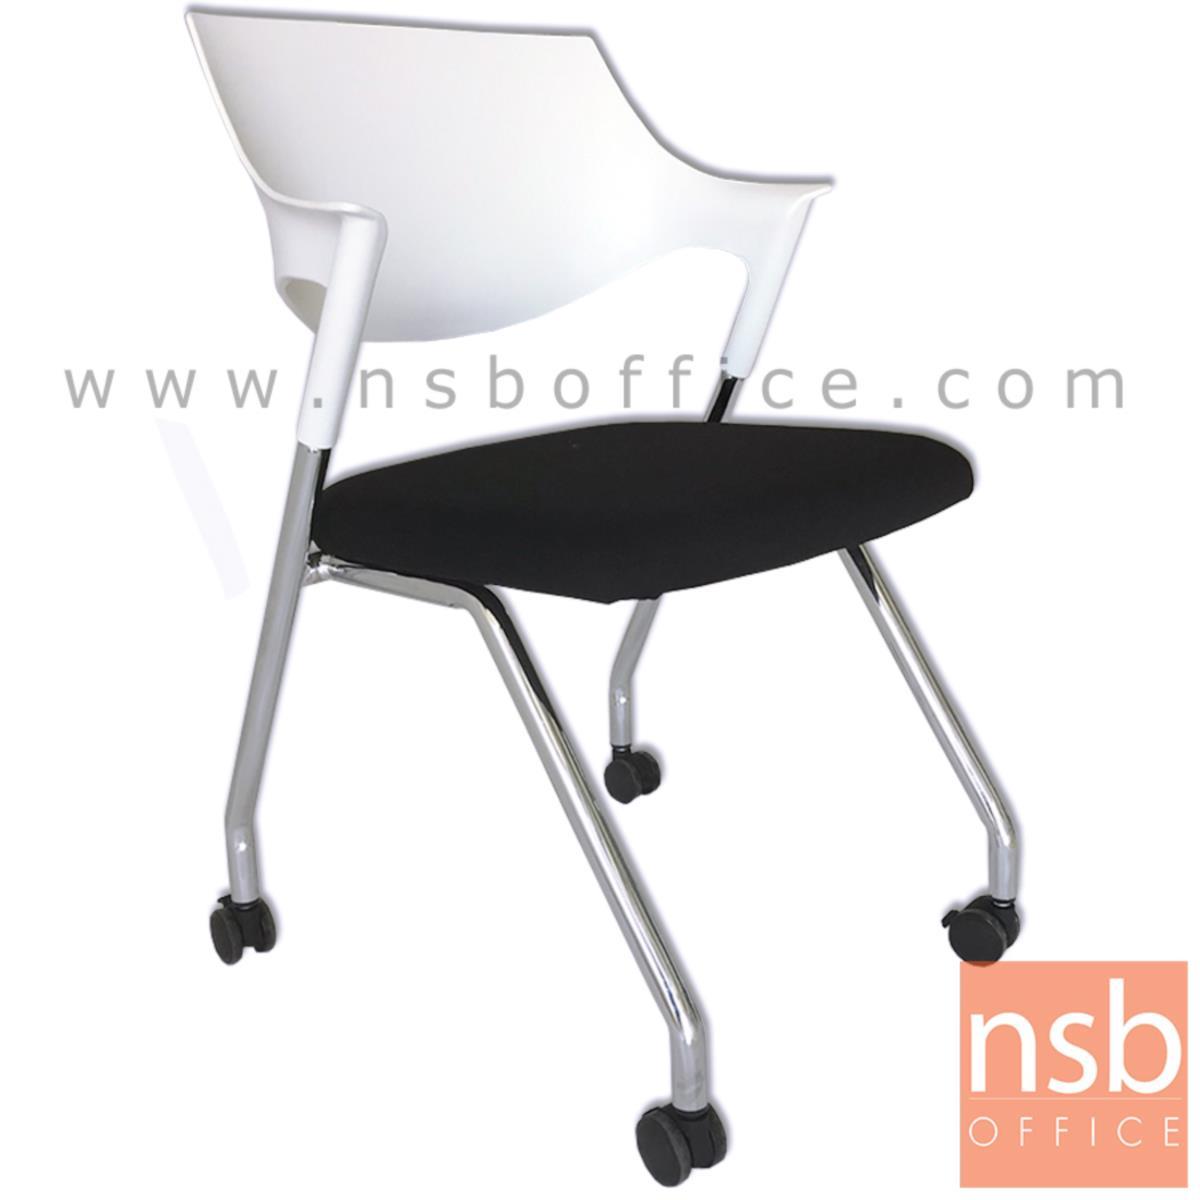 B30A048:เก้าอี้อเนกประสงค์โพลี่ล้วน รุ่น Blue Bell (บลู เบล)  โครงขาเหล็กชุบโครเมี่ยม